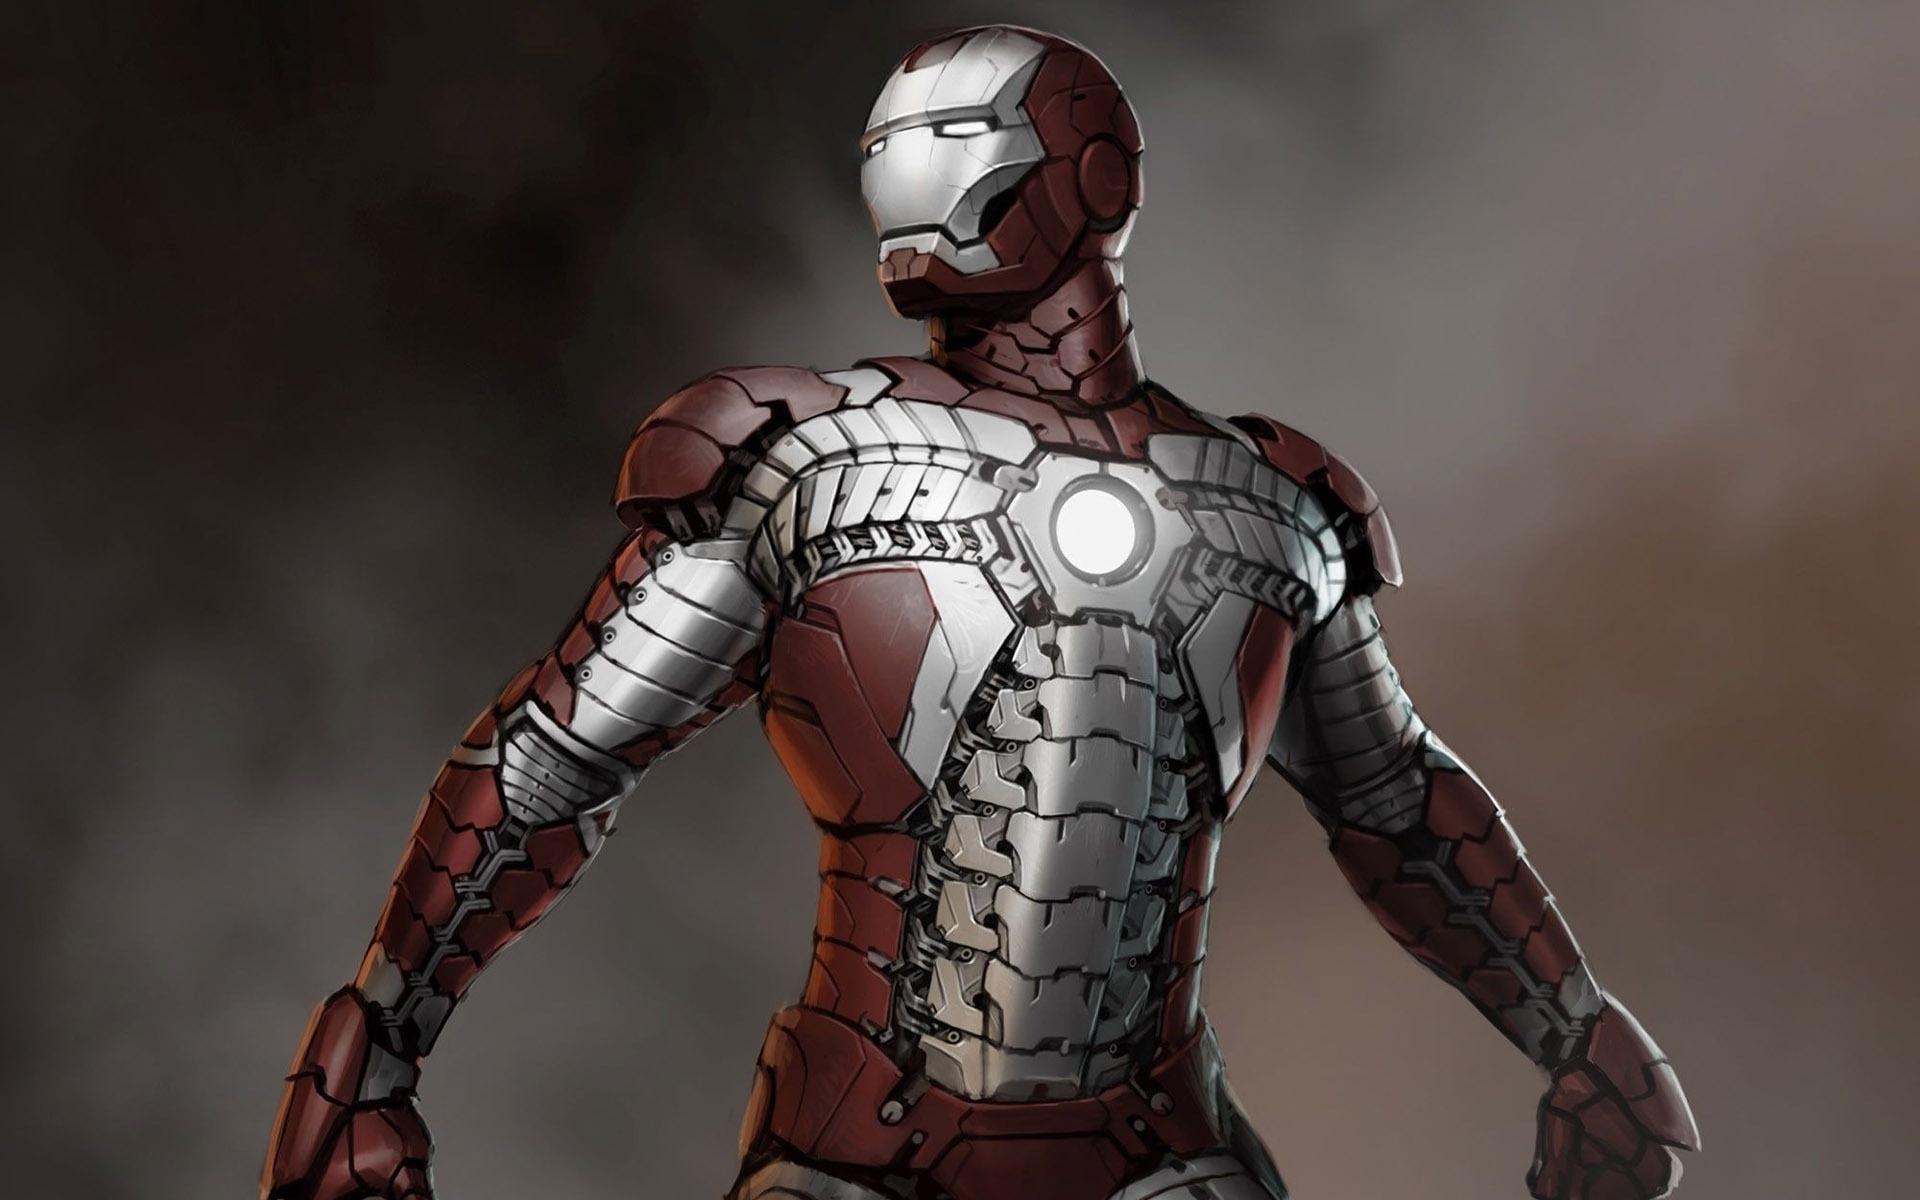 25 Cool Iron Man Wallpapers HD   MixHD wallpapers 1920x1200